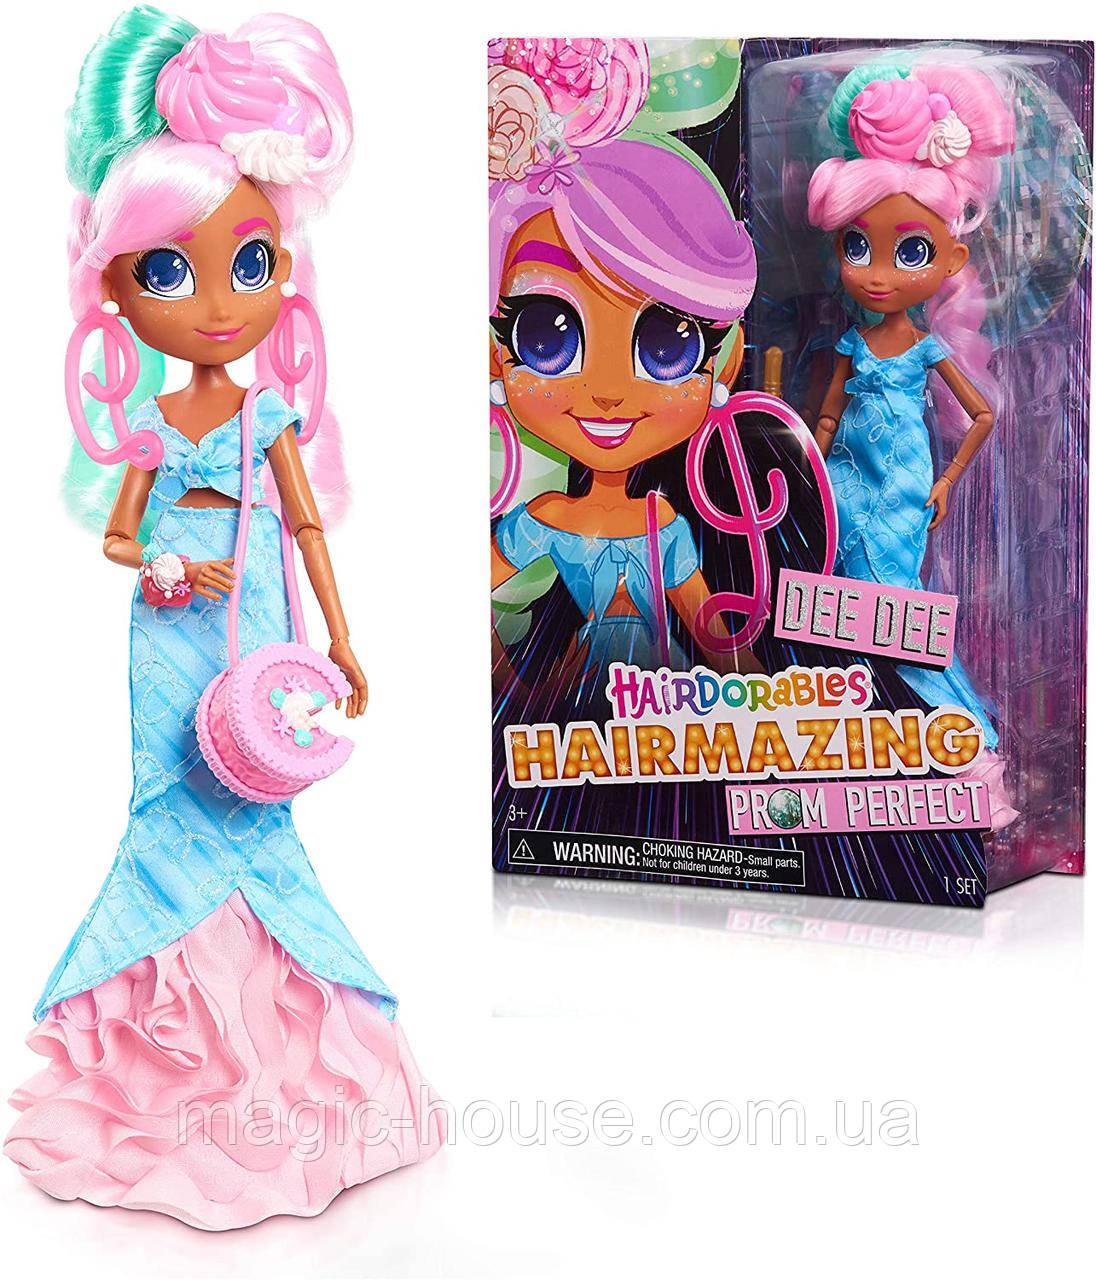 Hairdorables Hairmazing Prom Perfect Fashion Dolls, Dee Dee  Кукла Хэрдораблс Ди Ди 2 серия Оригинал!